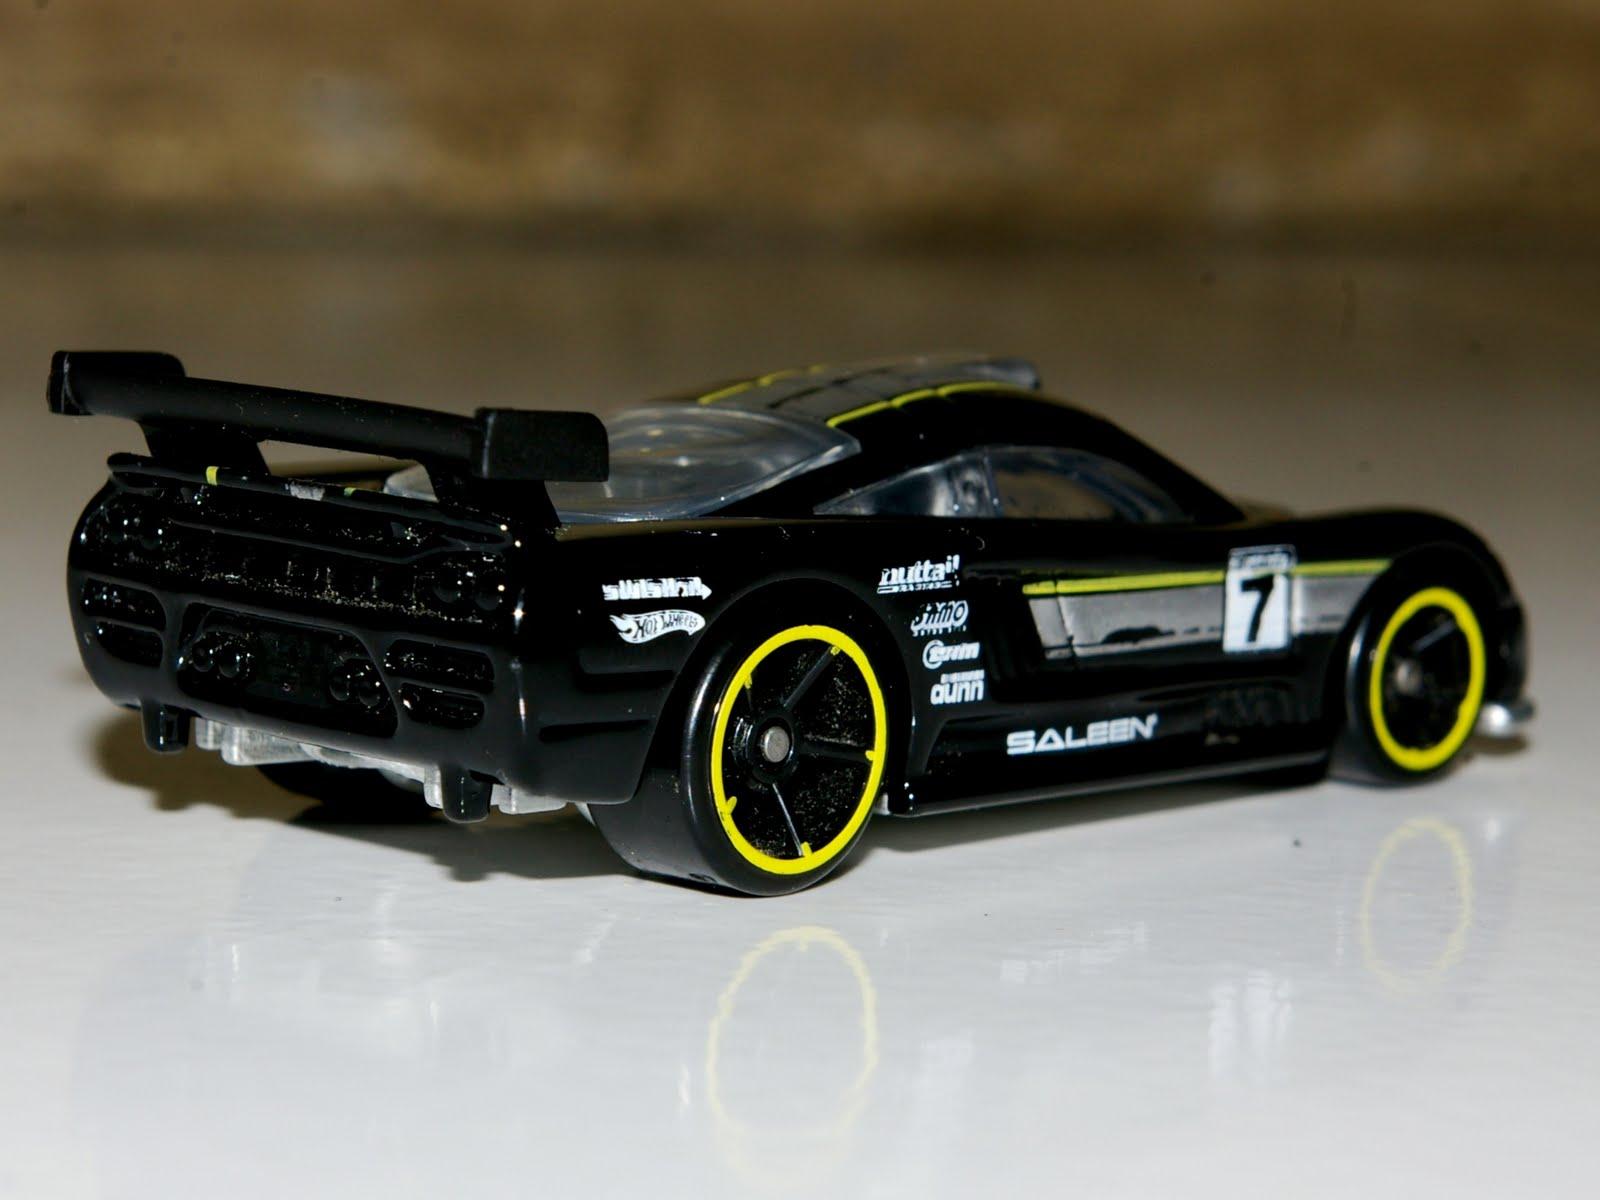 IMGP7006 Surprising Lamborghini Gallardo Hot Wheels Wiki Cars Trend